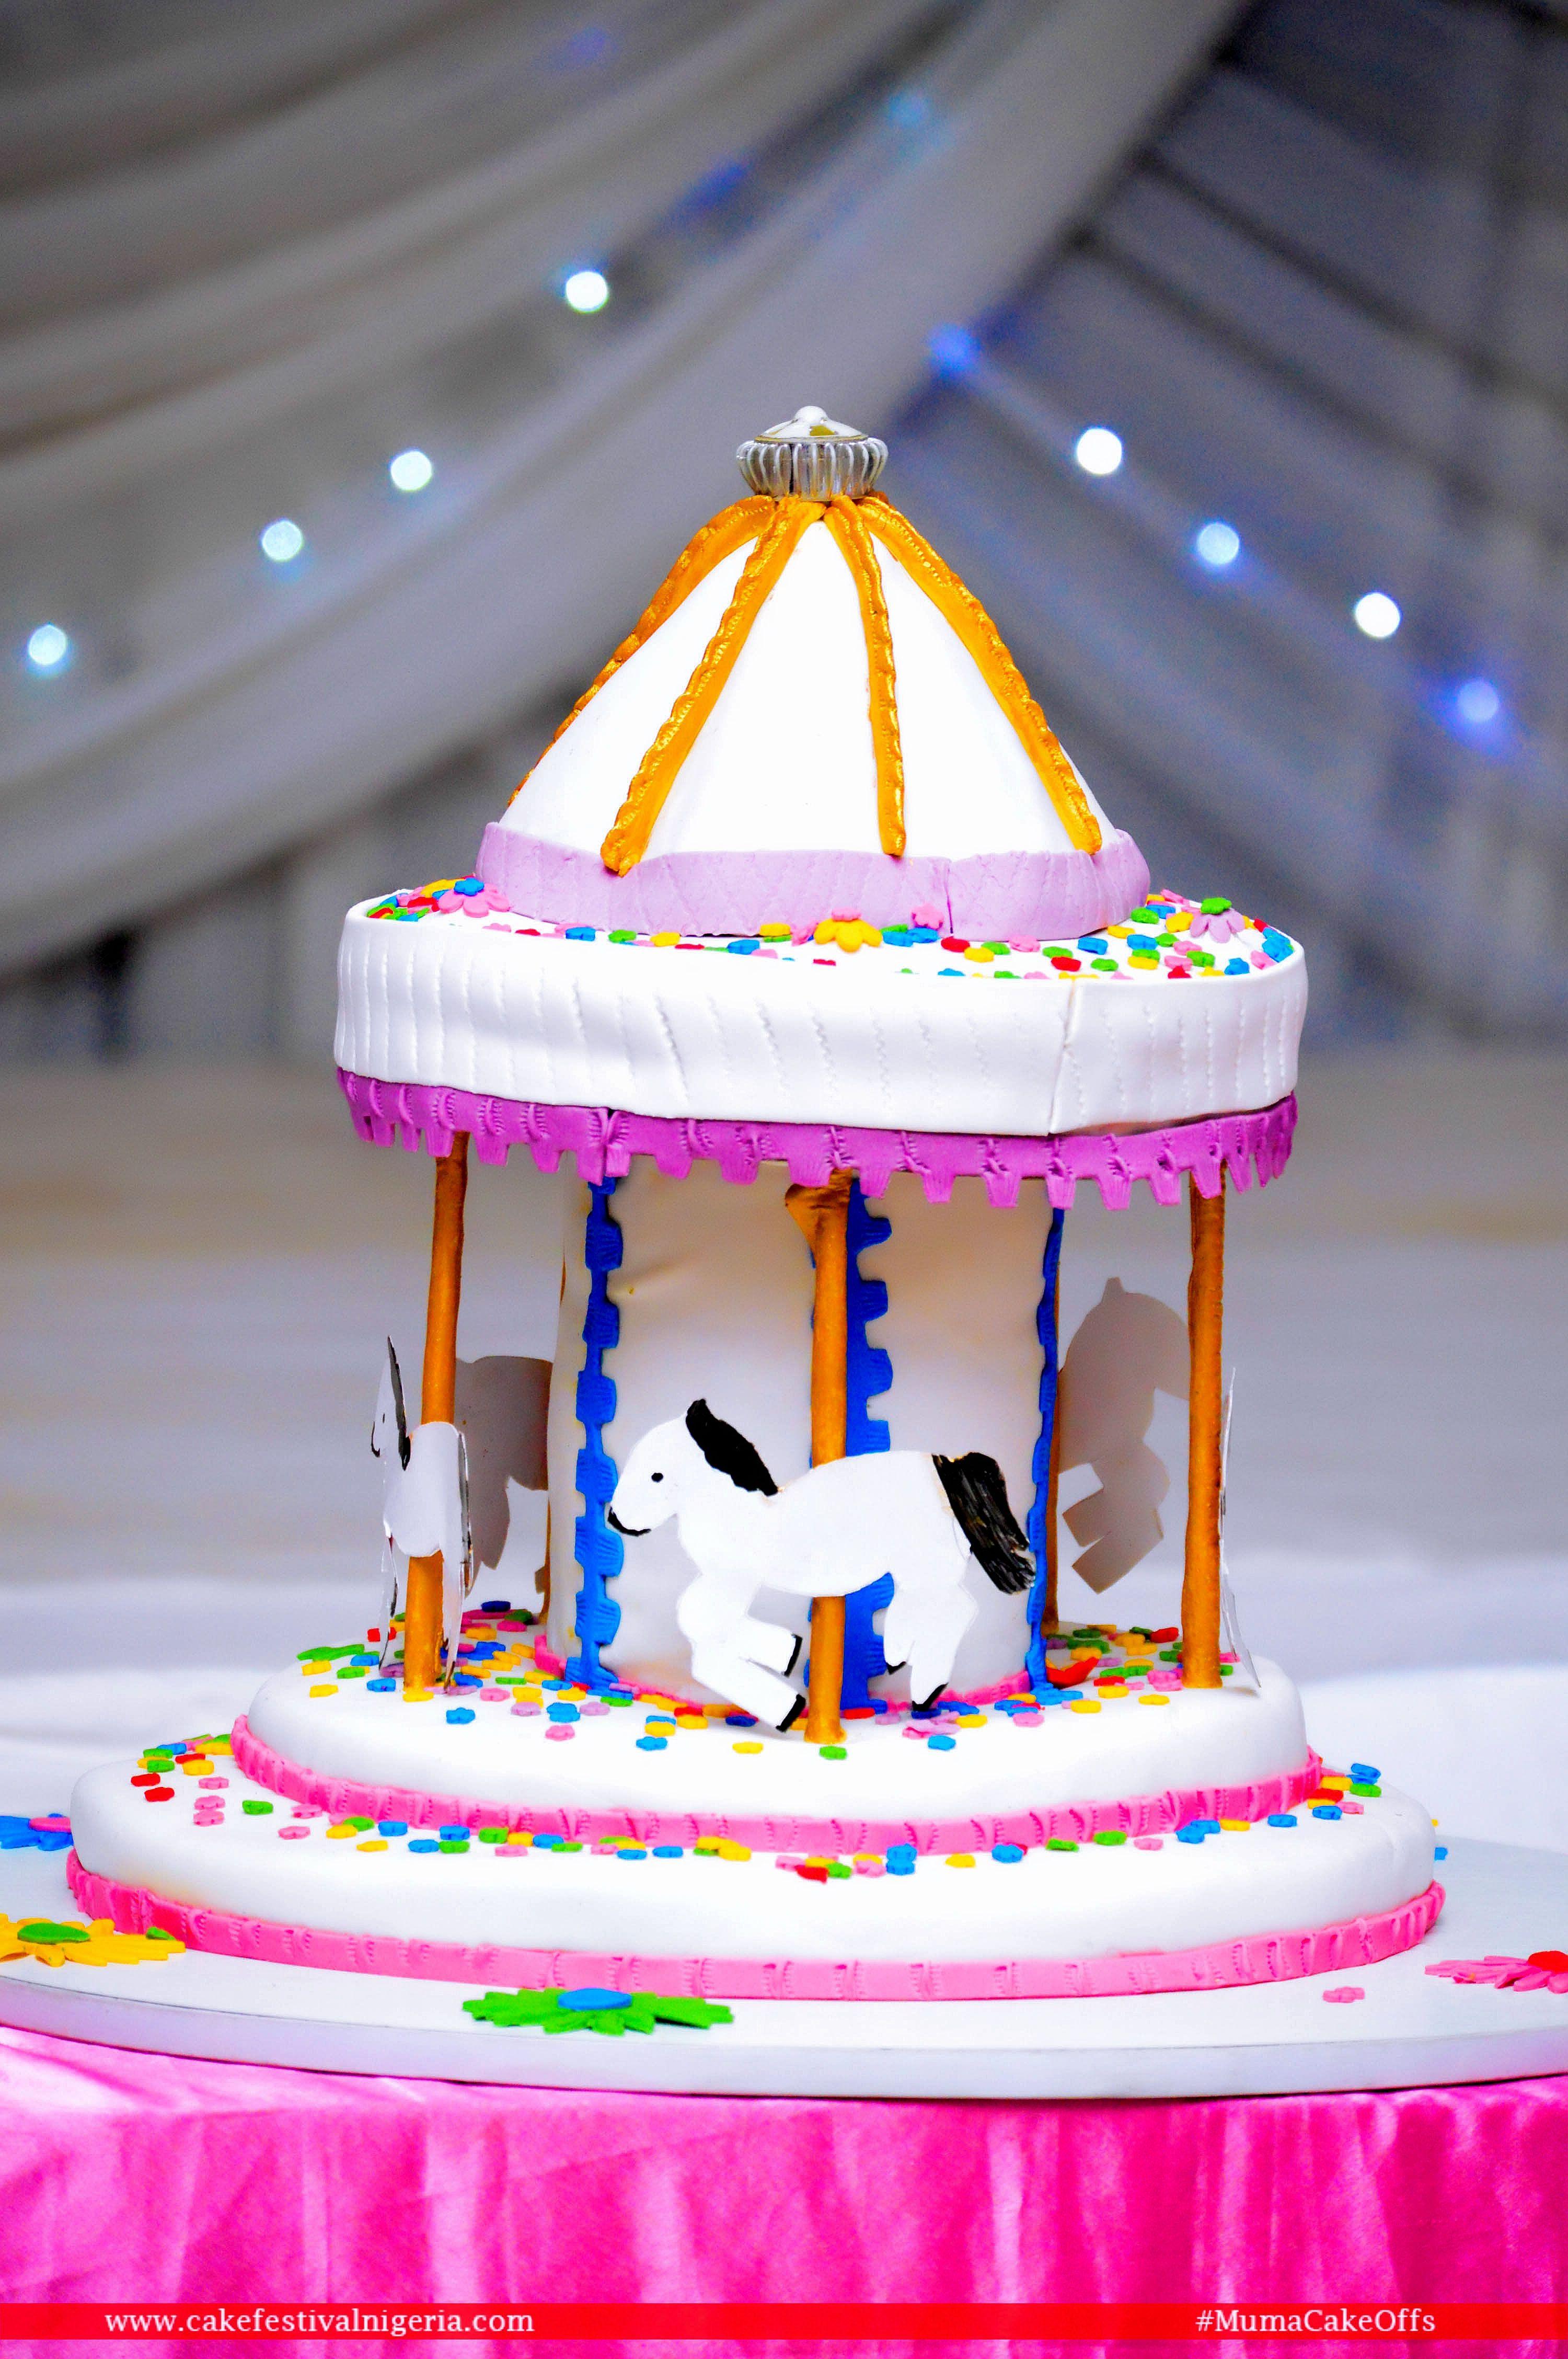 Wedding decorations nigeria  Roller coaster Cake idea at the MumaCakeOffs  MumaCakeOffs